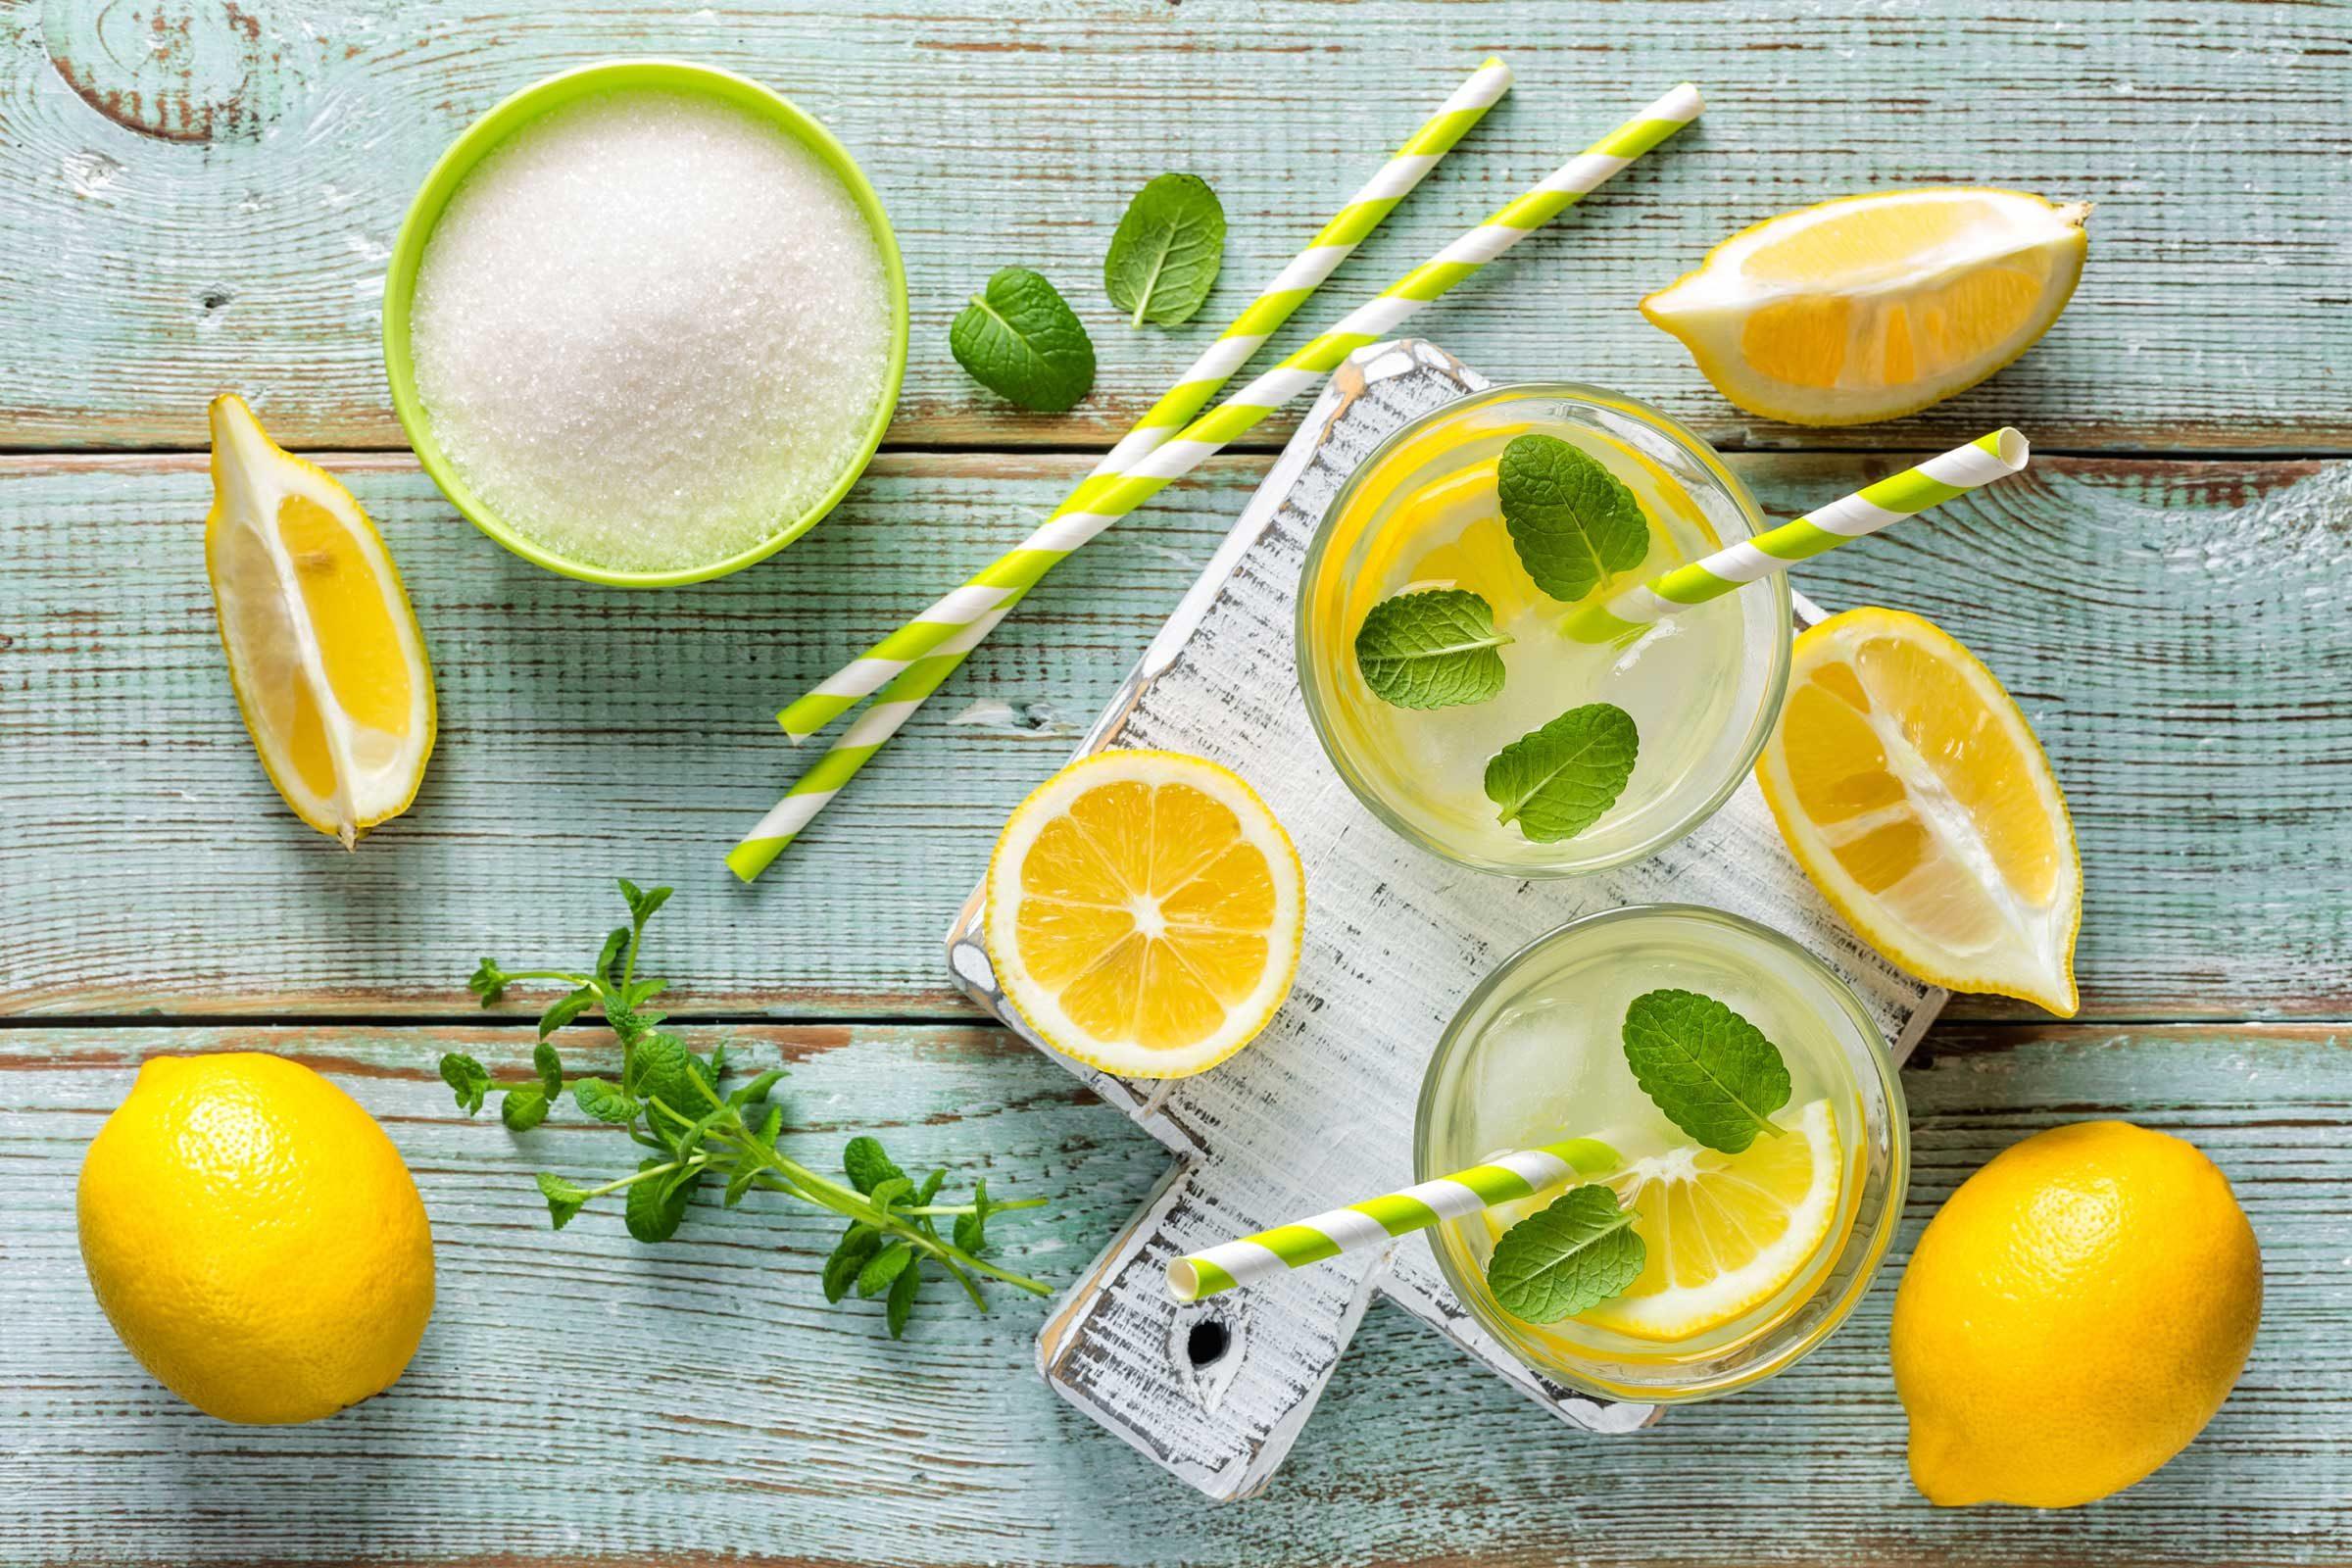 Make a batch of fresh lemonade or limeade